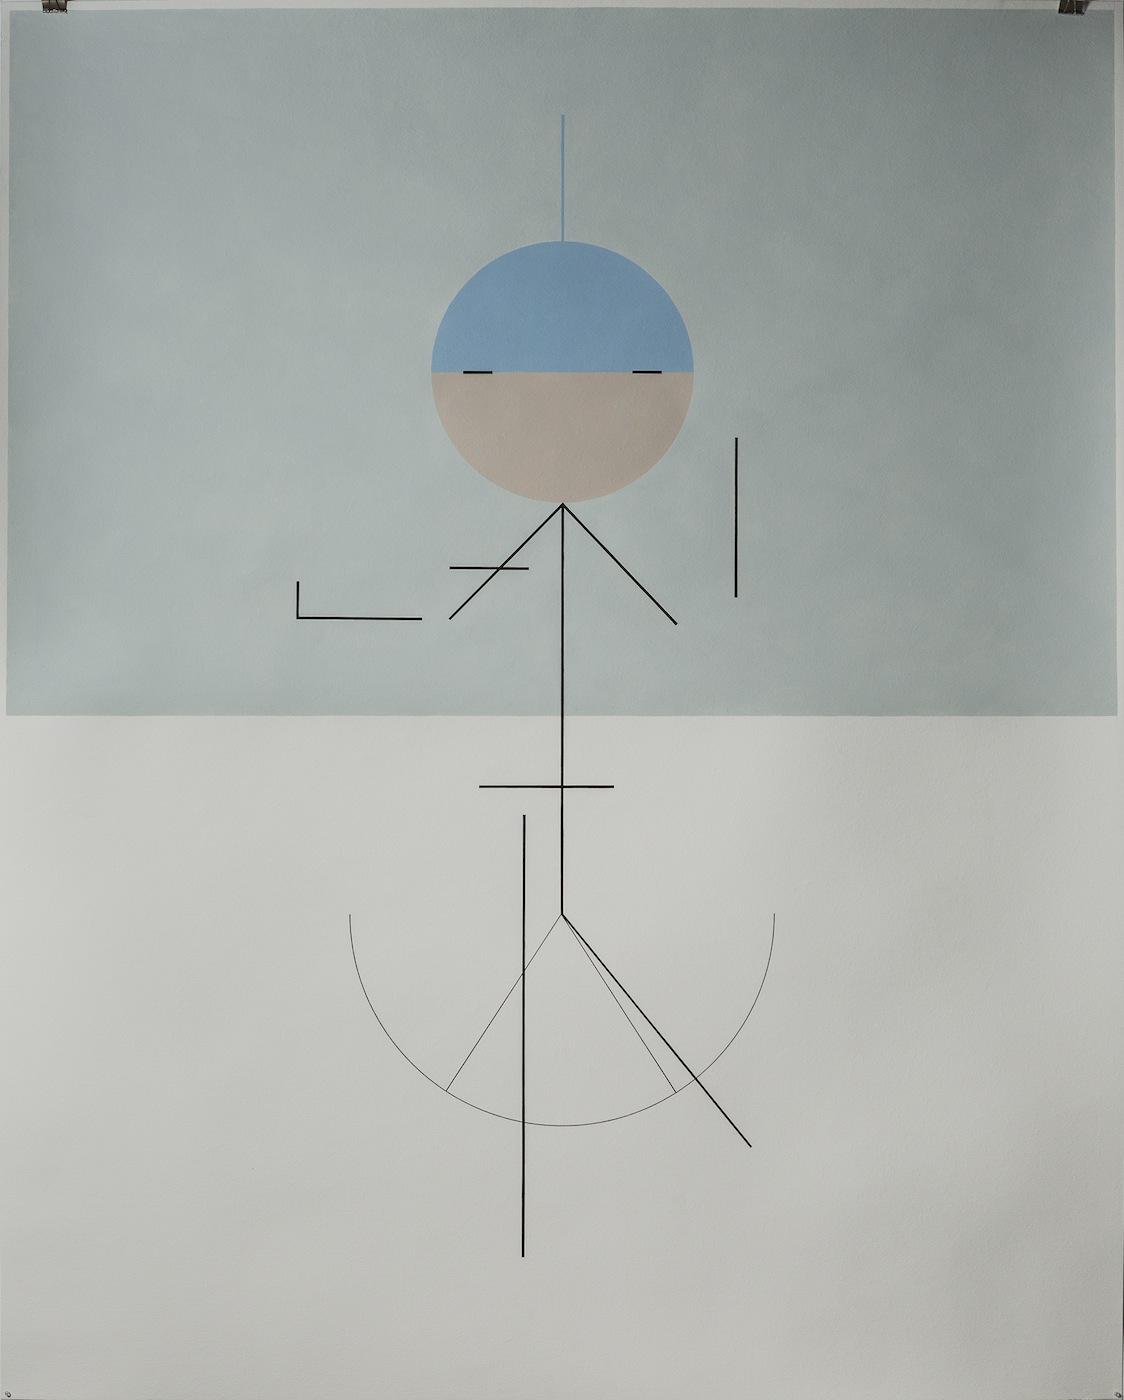 Bliss 2014 Acrylic on paper 152 x 122 cm